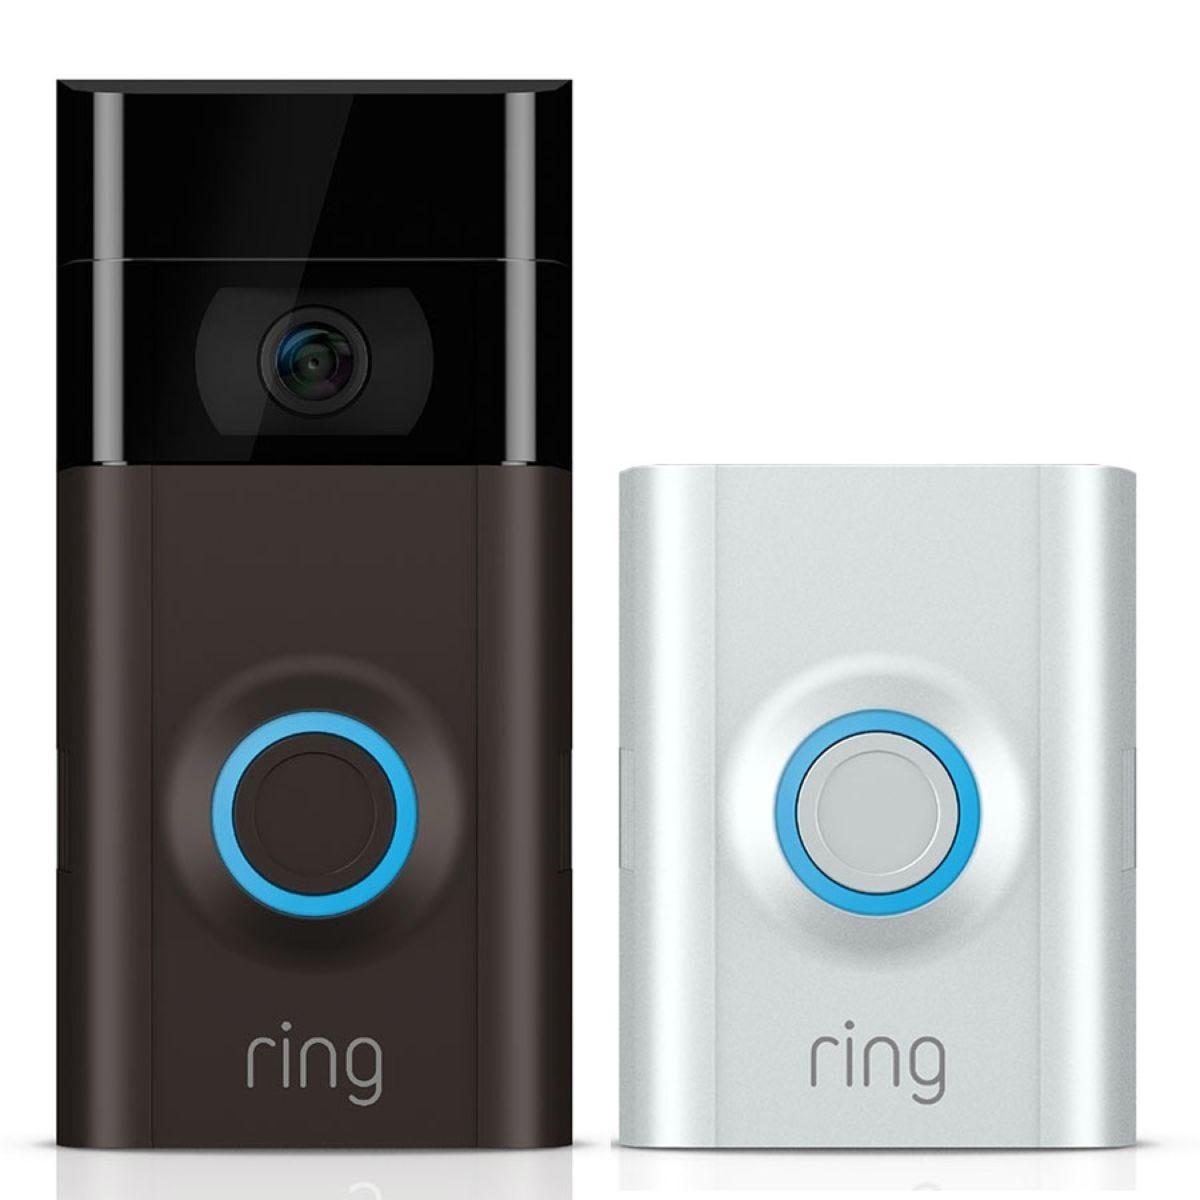 Ring Wi-Fi Video Doorbell 2